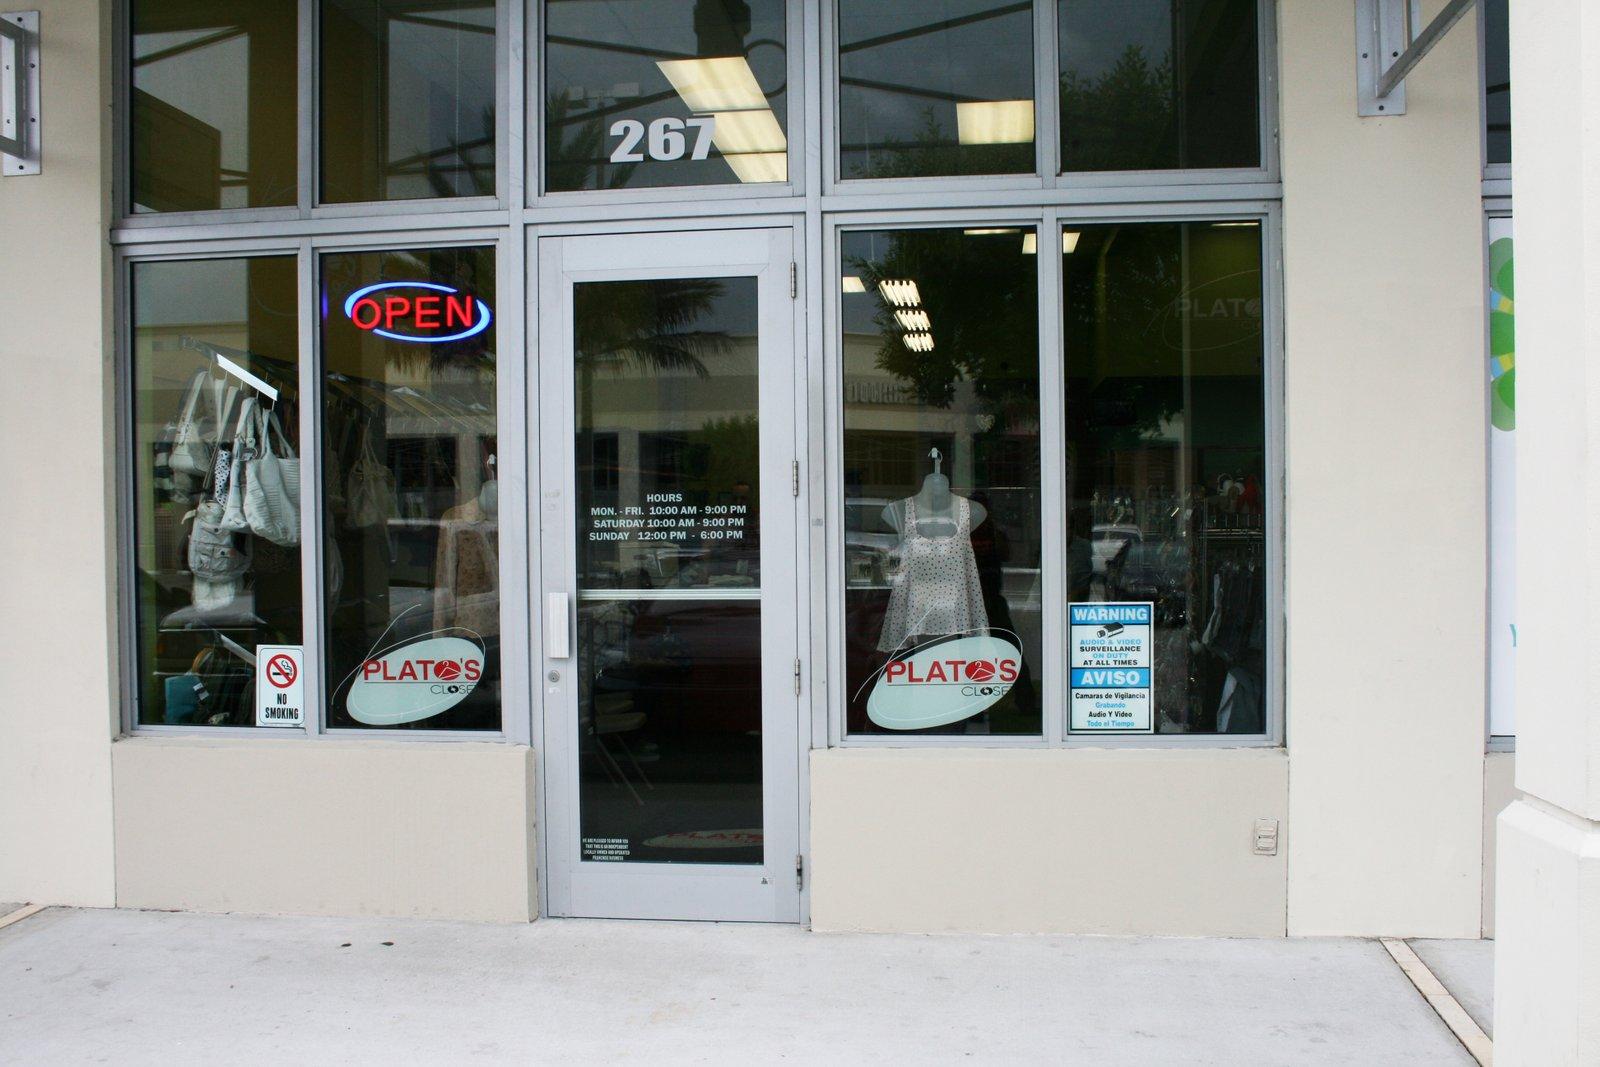 Store Front Retail Signage Amp Window Wraps Miami Florida Plato S Closet